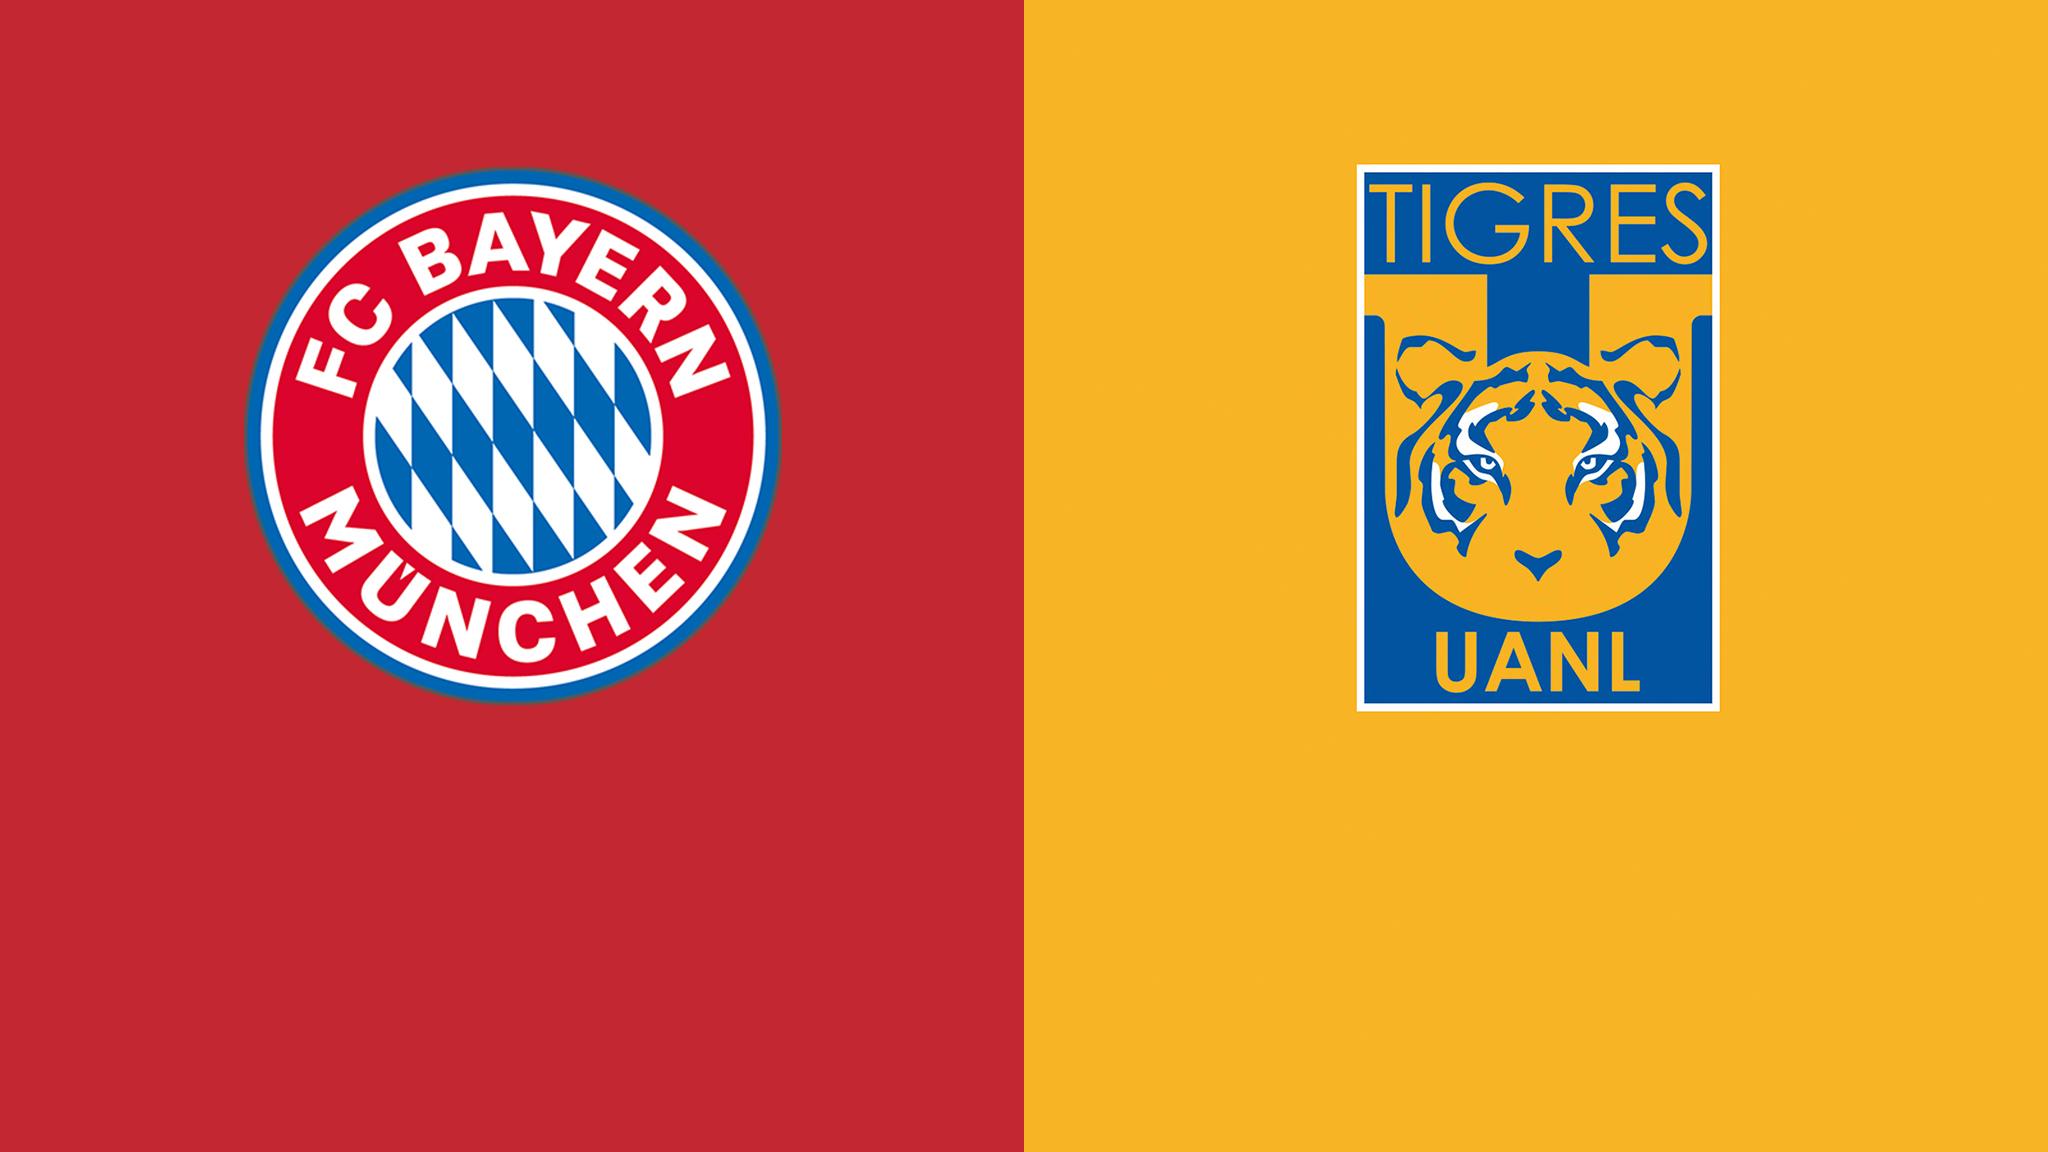 Bayern Munich vs Tigres